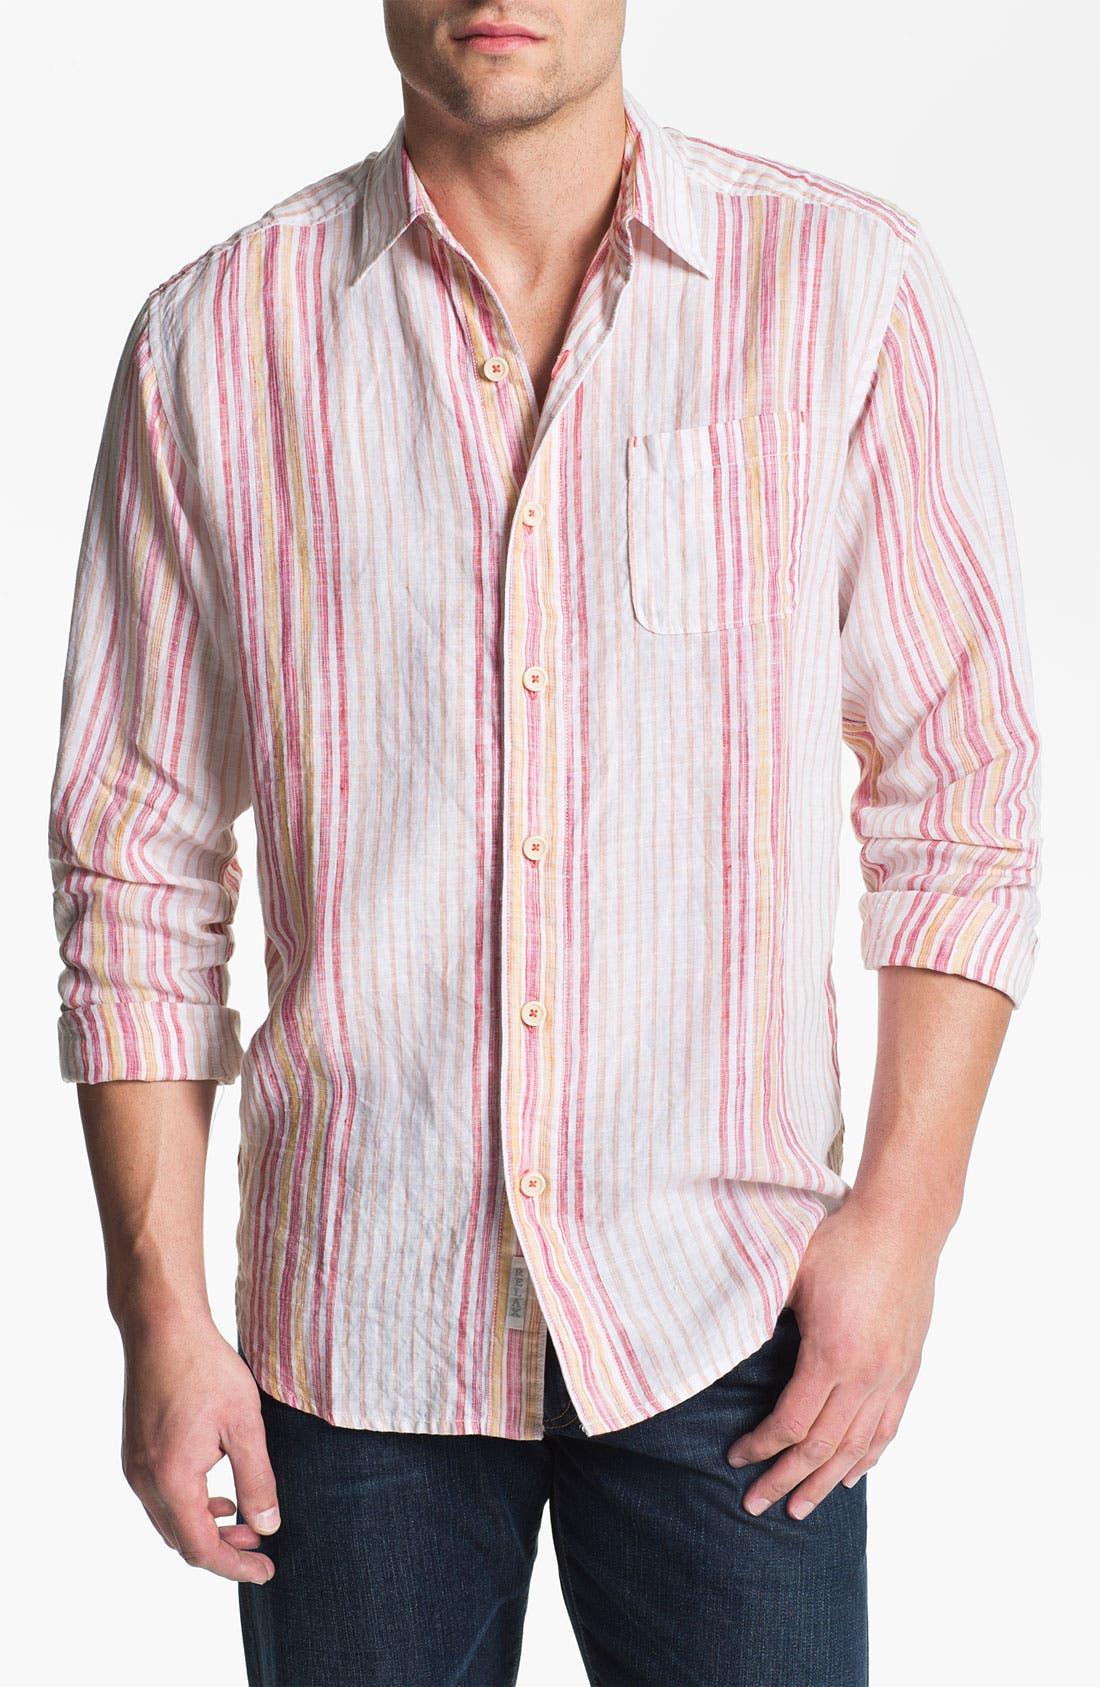 Alternate Image 1 Selected - Tommy Bahama 'Coconut Lanes' Linen Sport Shirt (Big & Tall)